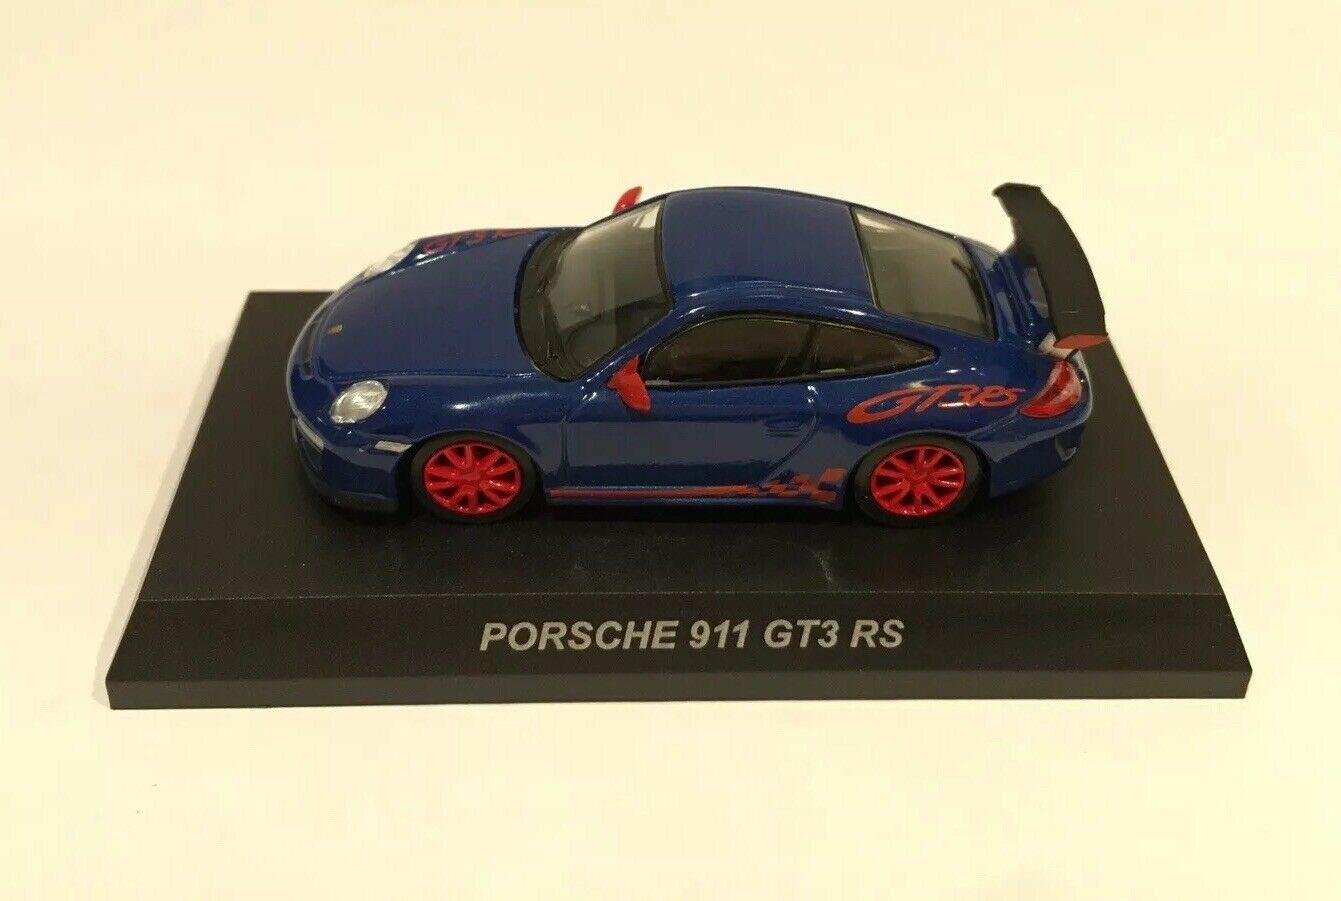 Kyosho 1 64 Porsche V Diecast Car Model 911 Gt3 Rs Blue King Crab Collectibles